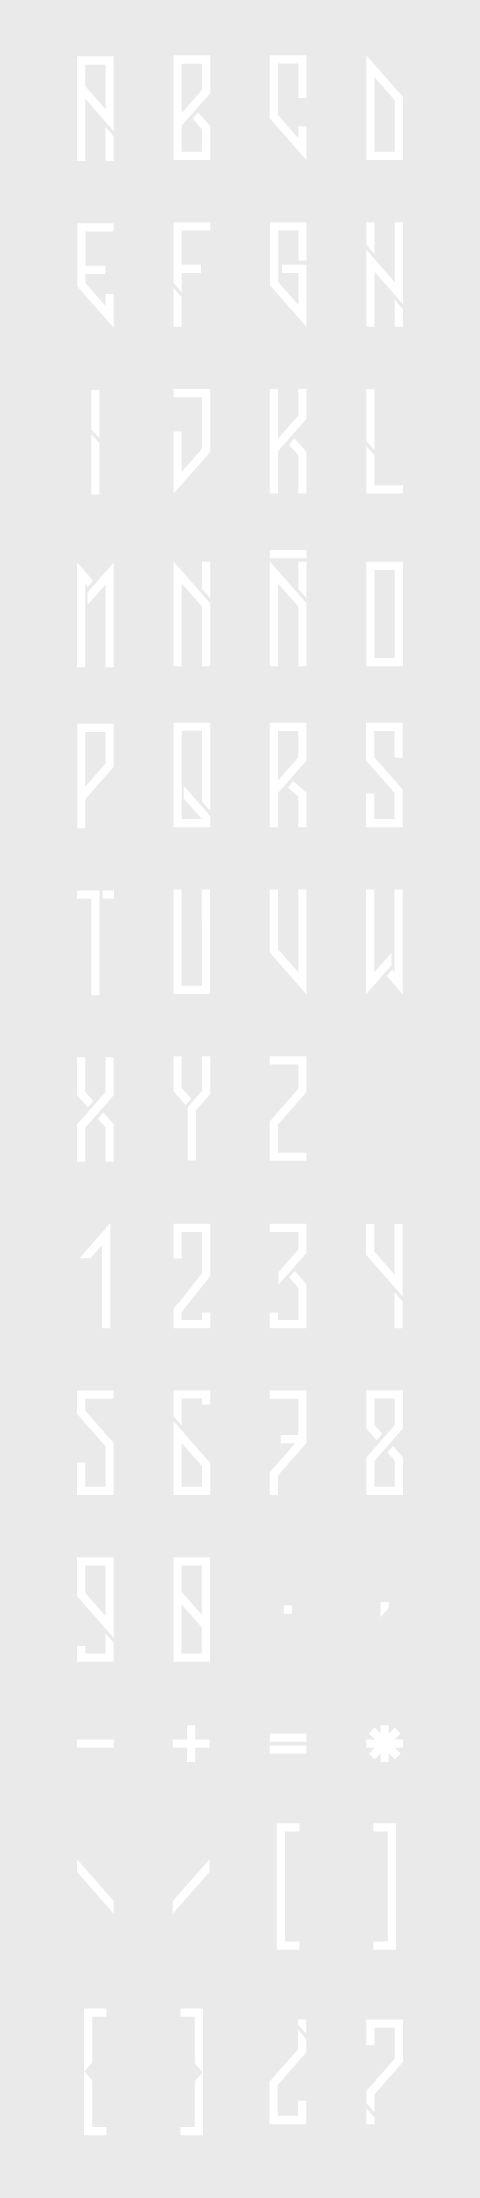 VUJ Type - modular